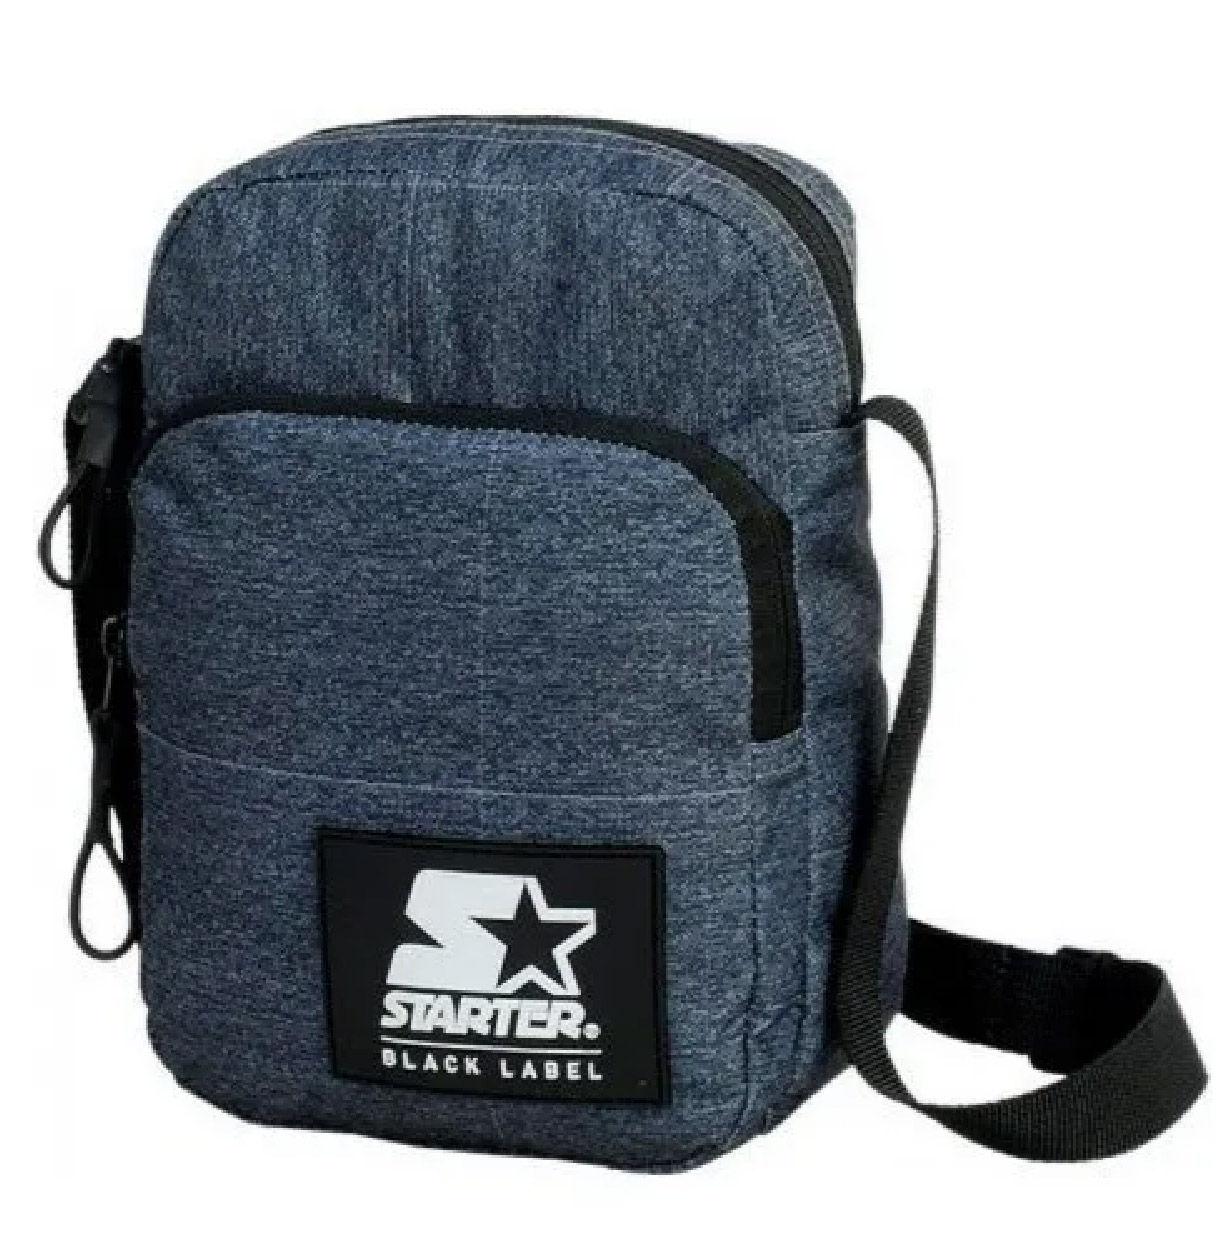 Shoulder Bag Black Label Starter Bolsa Lateral Original Mochila Transversal Passeio